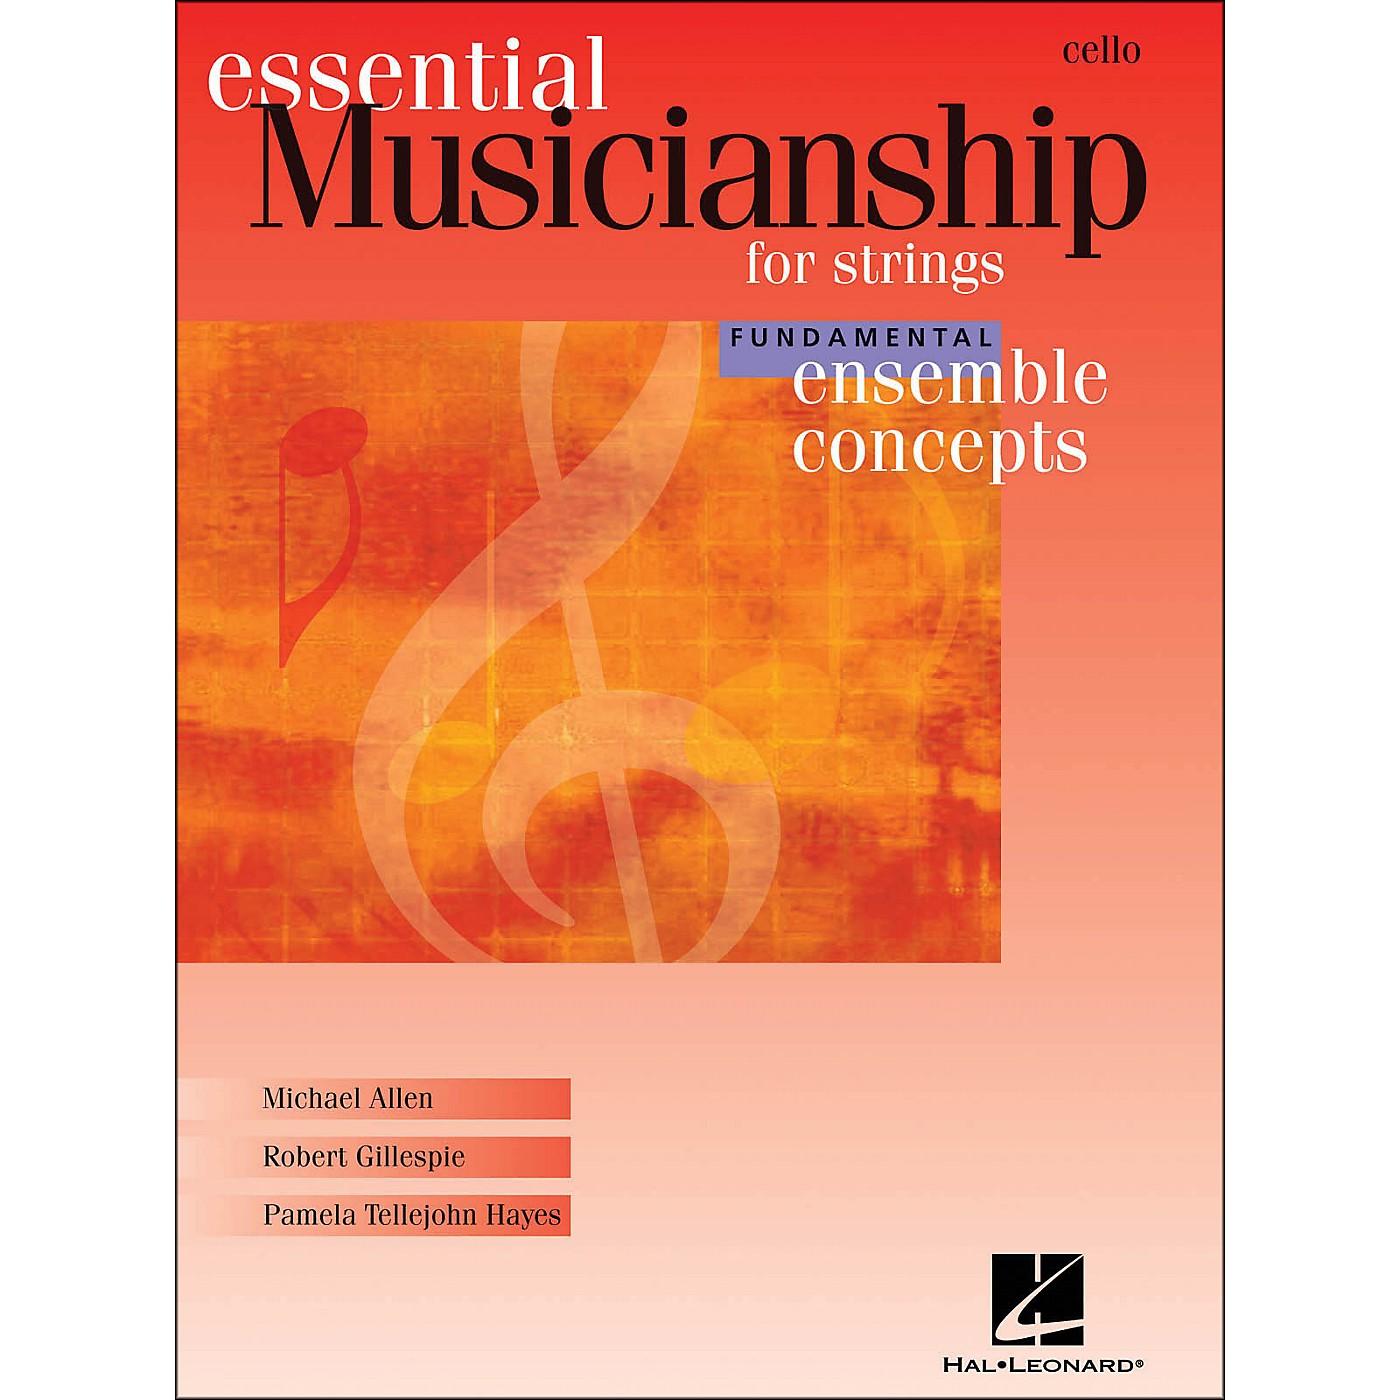 Hal Leonard Essential Musicianship for Strings - Ensemble Concepts Fundamental Cello thumbnail